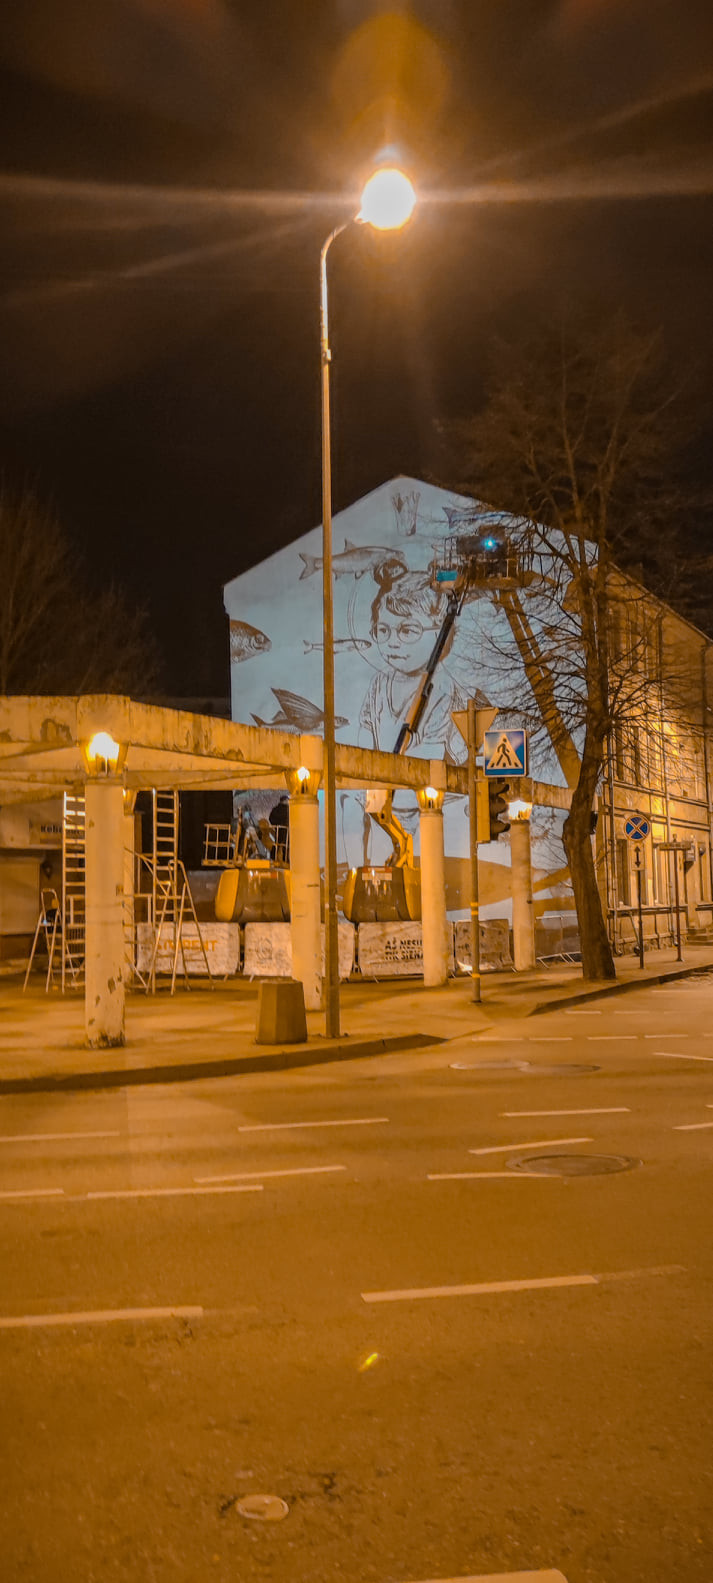 gatvės menas siena Klaipėda janonio gatvė grafitti vreators 76